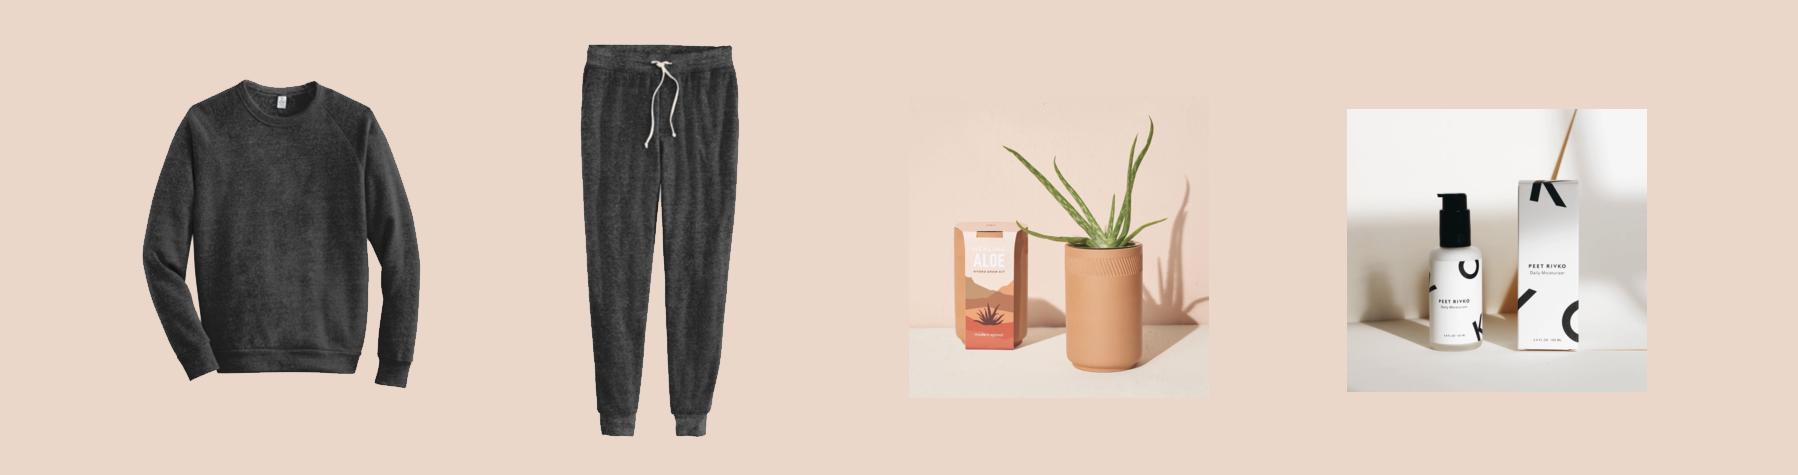 Alternative Eco Shirt, Alternative Joggers, Terracotta Grow Kit, and Peet Rivko Moisturizer